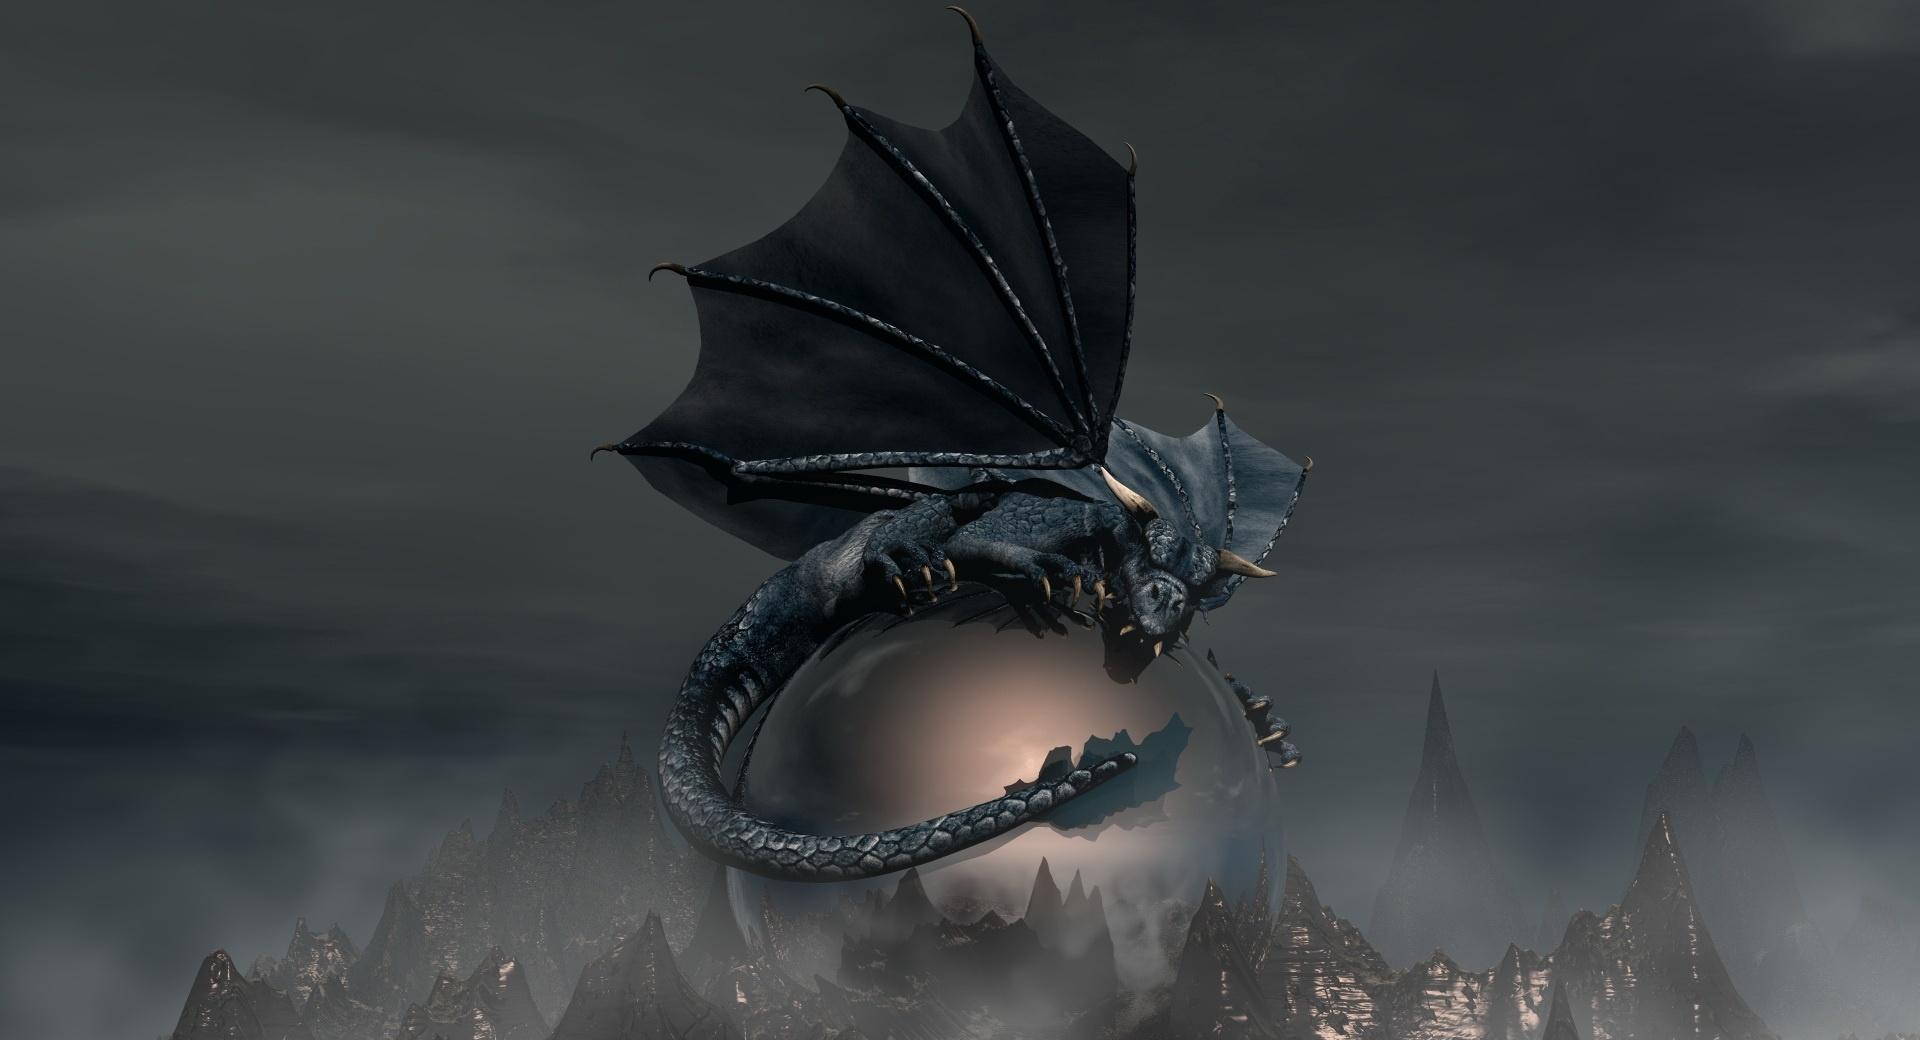 Black Dragon at 1024 x 1024 iPad size wallpapers HD quality